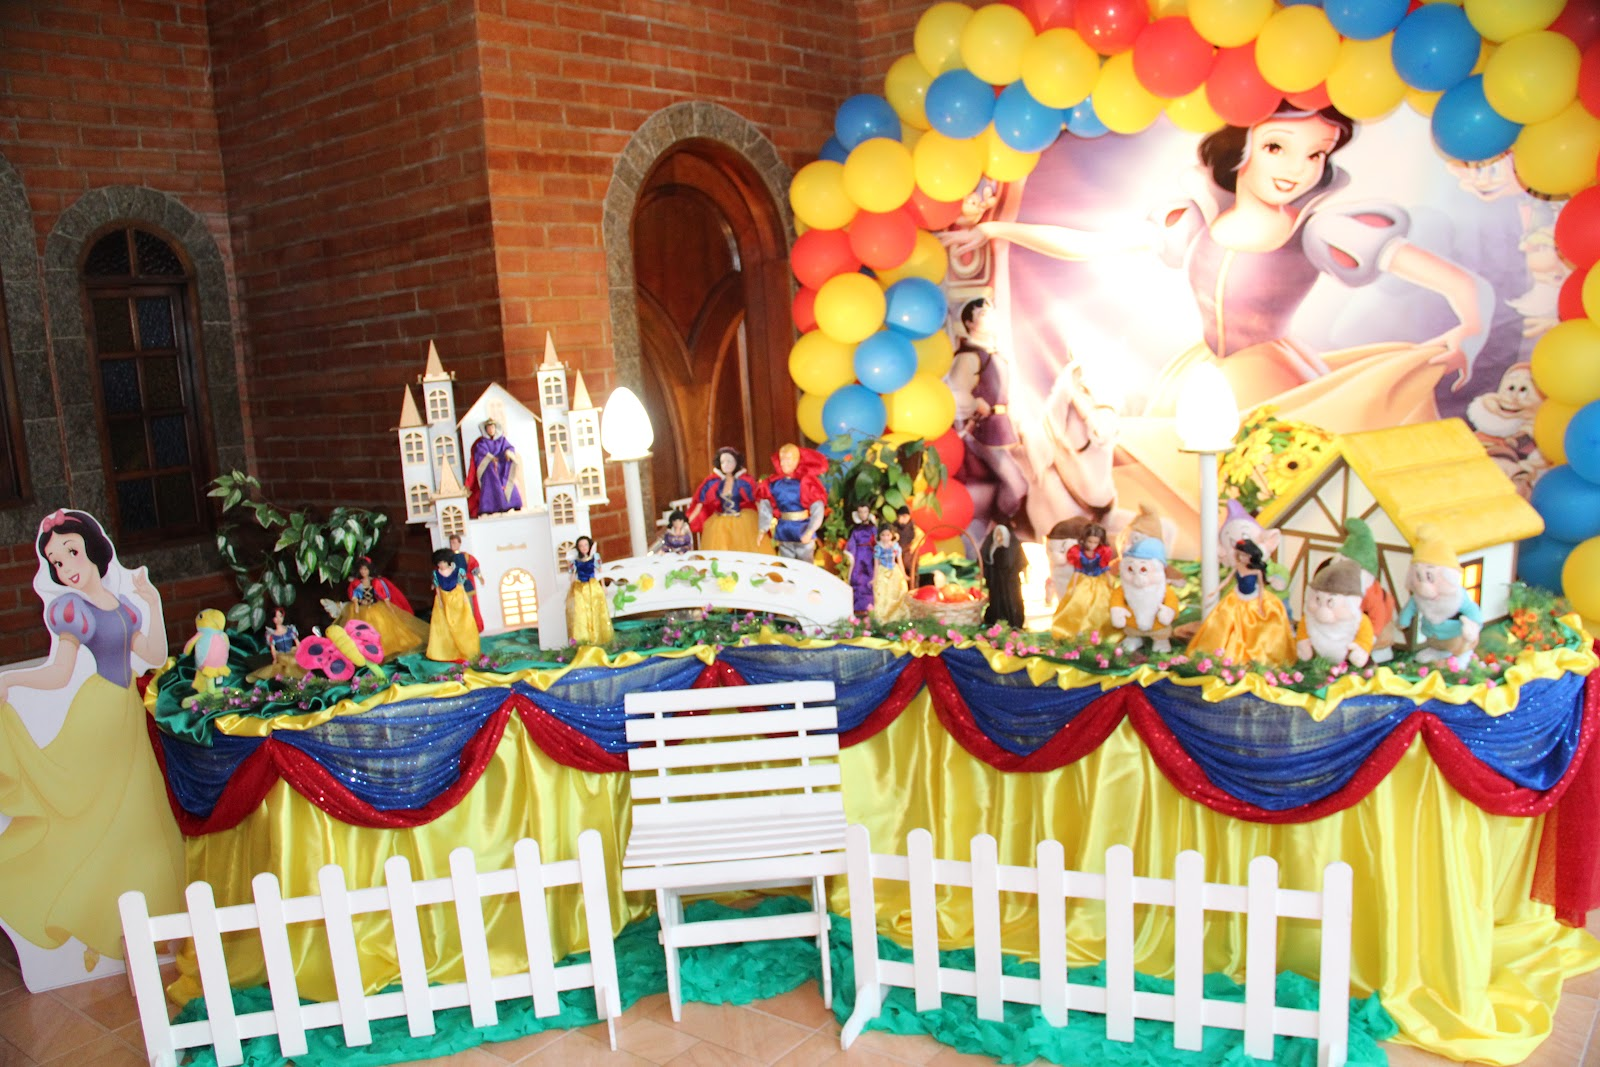 decoracao festa infantil tema branca de neve:tema de festa infantil da Branca de Neve e os sete anões